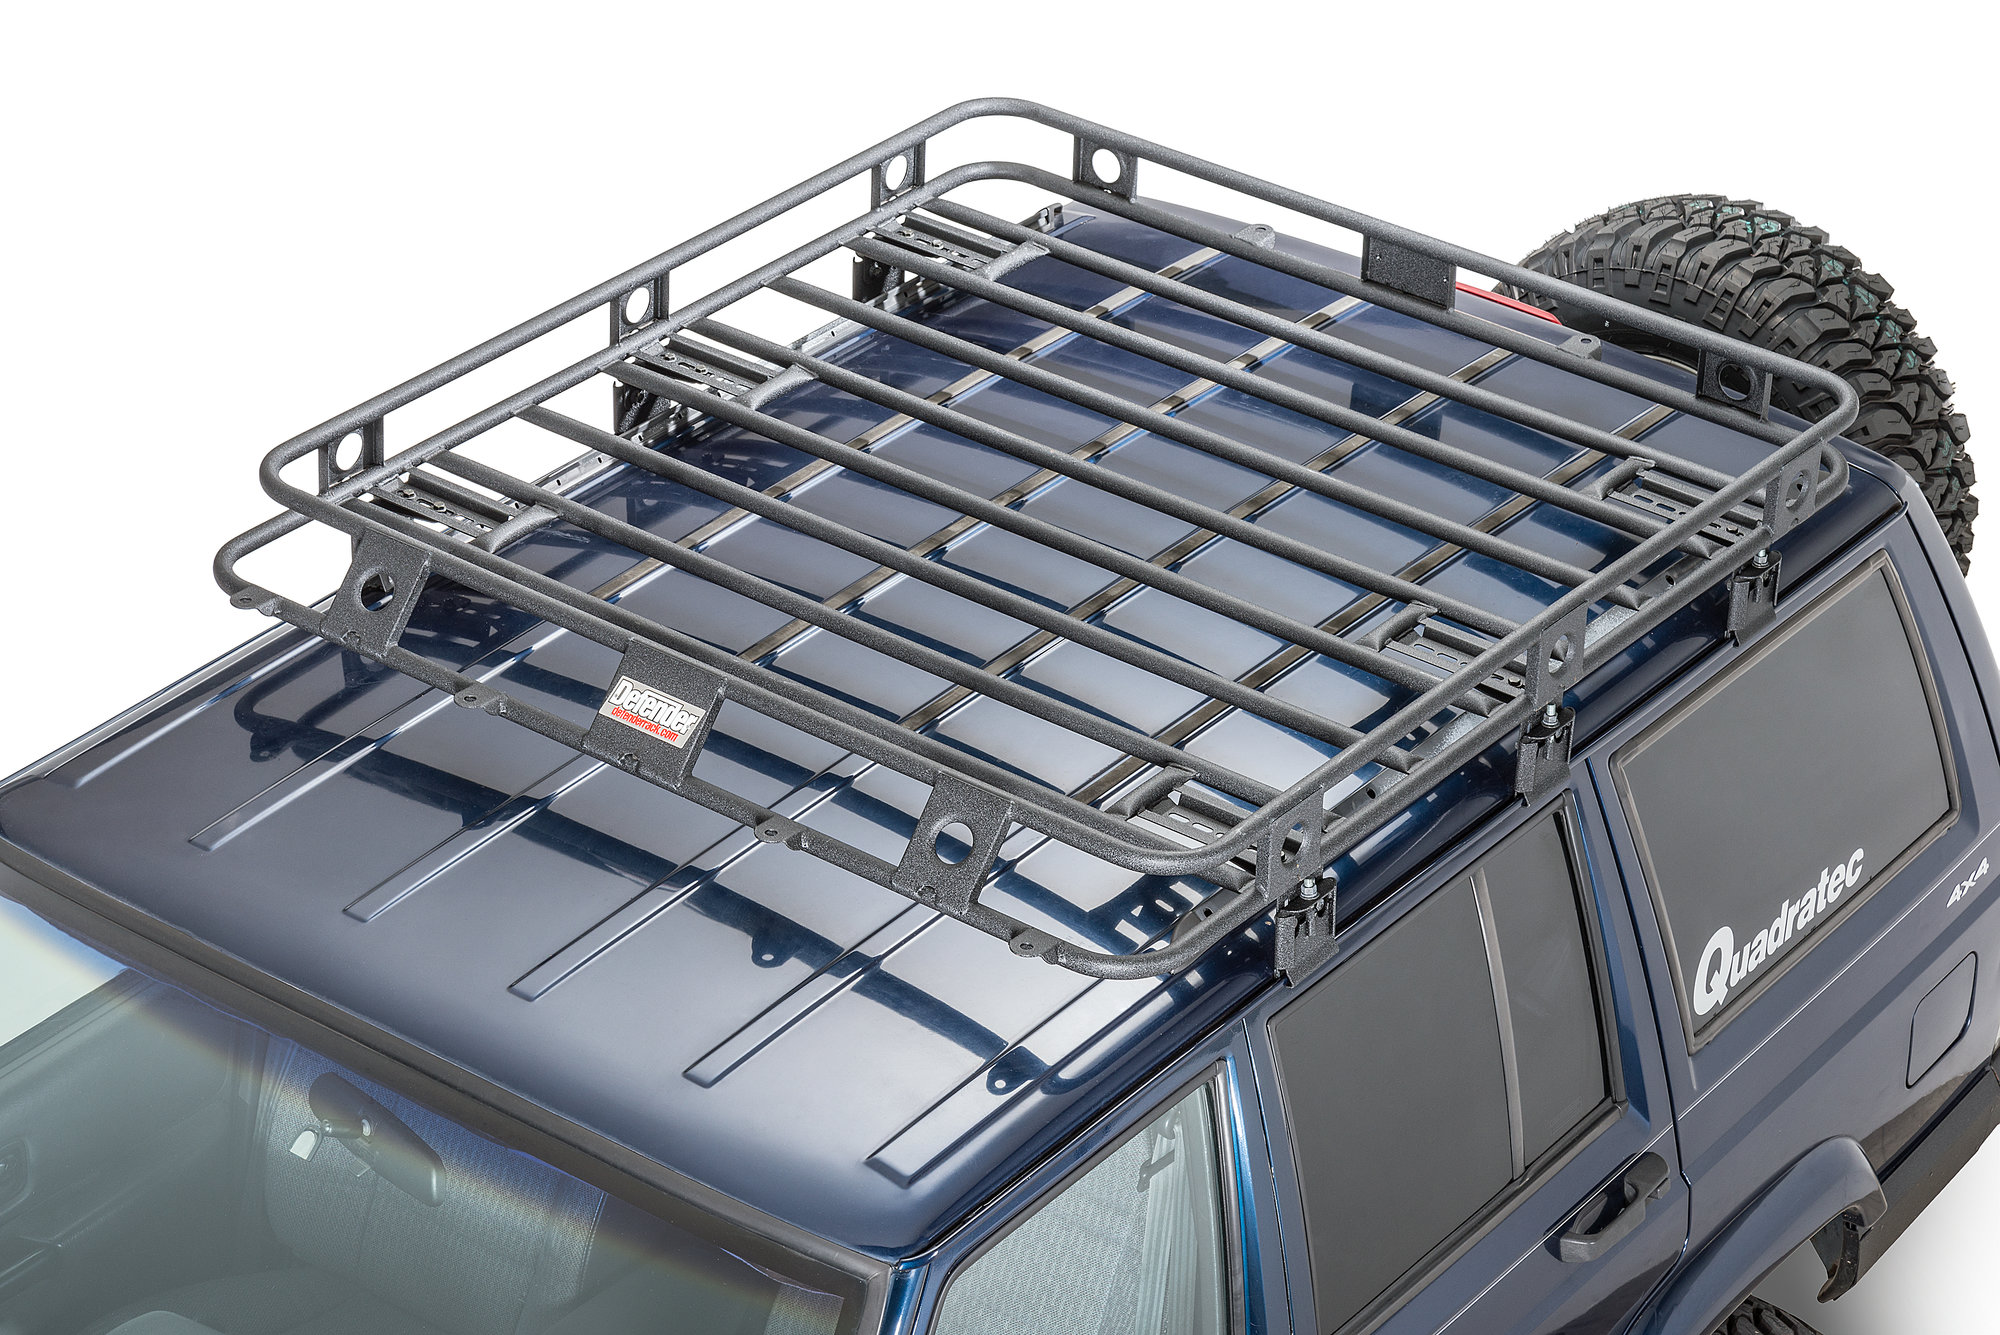 Smittybilt Defender Roof Rack For 84 89 Jeep Cherokee Xj